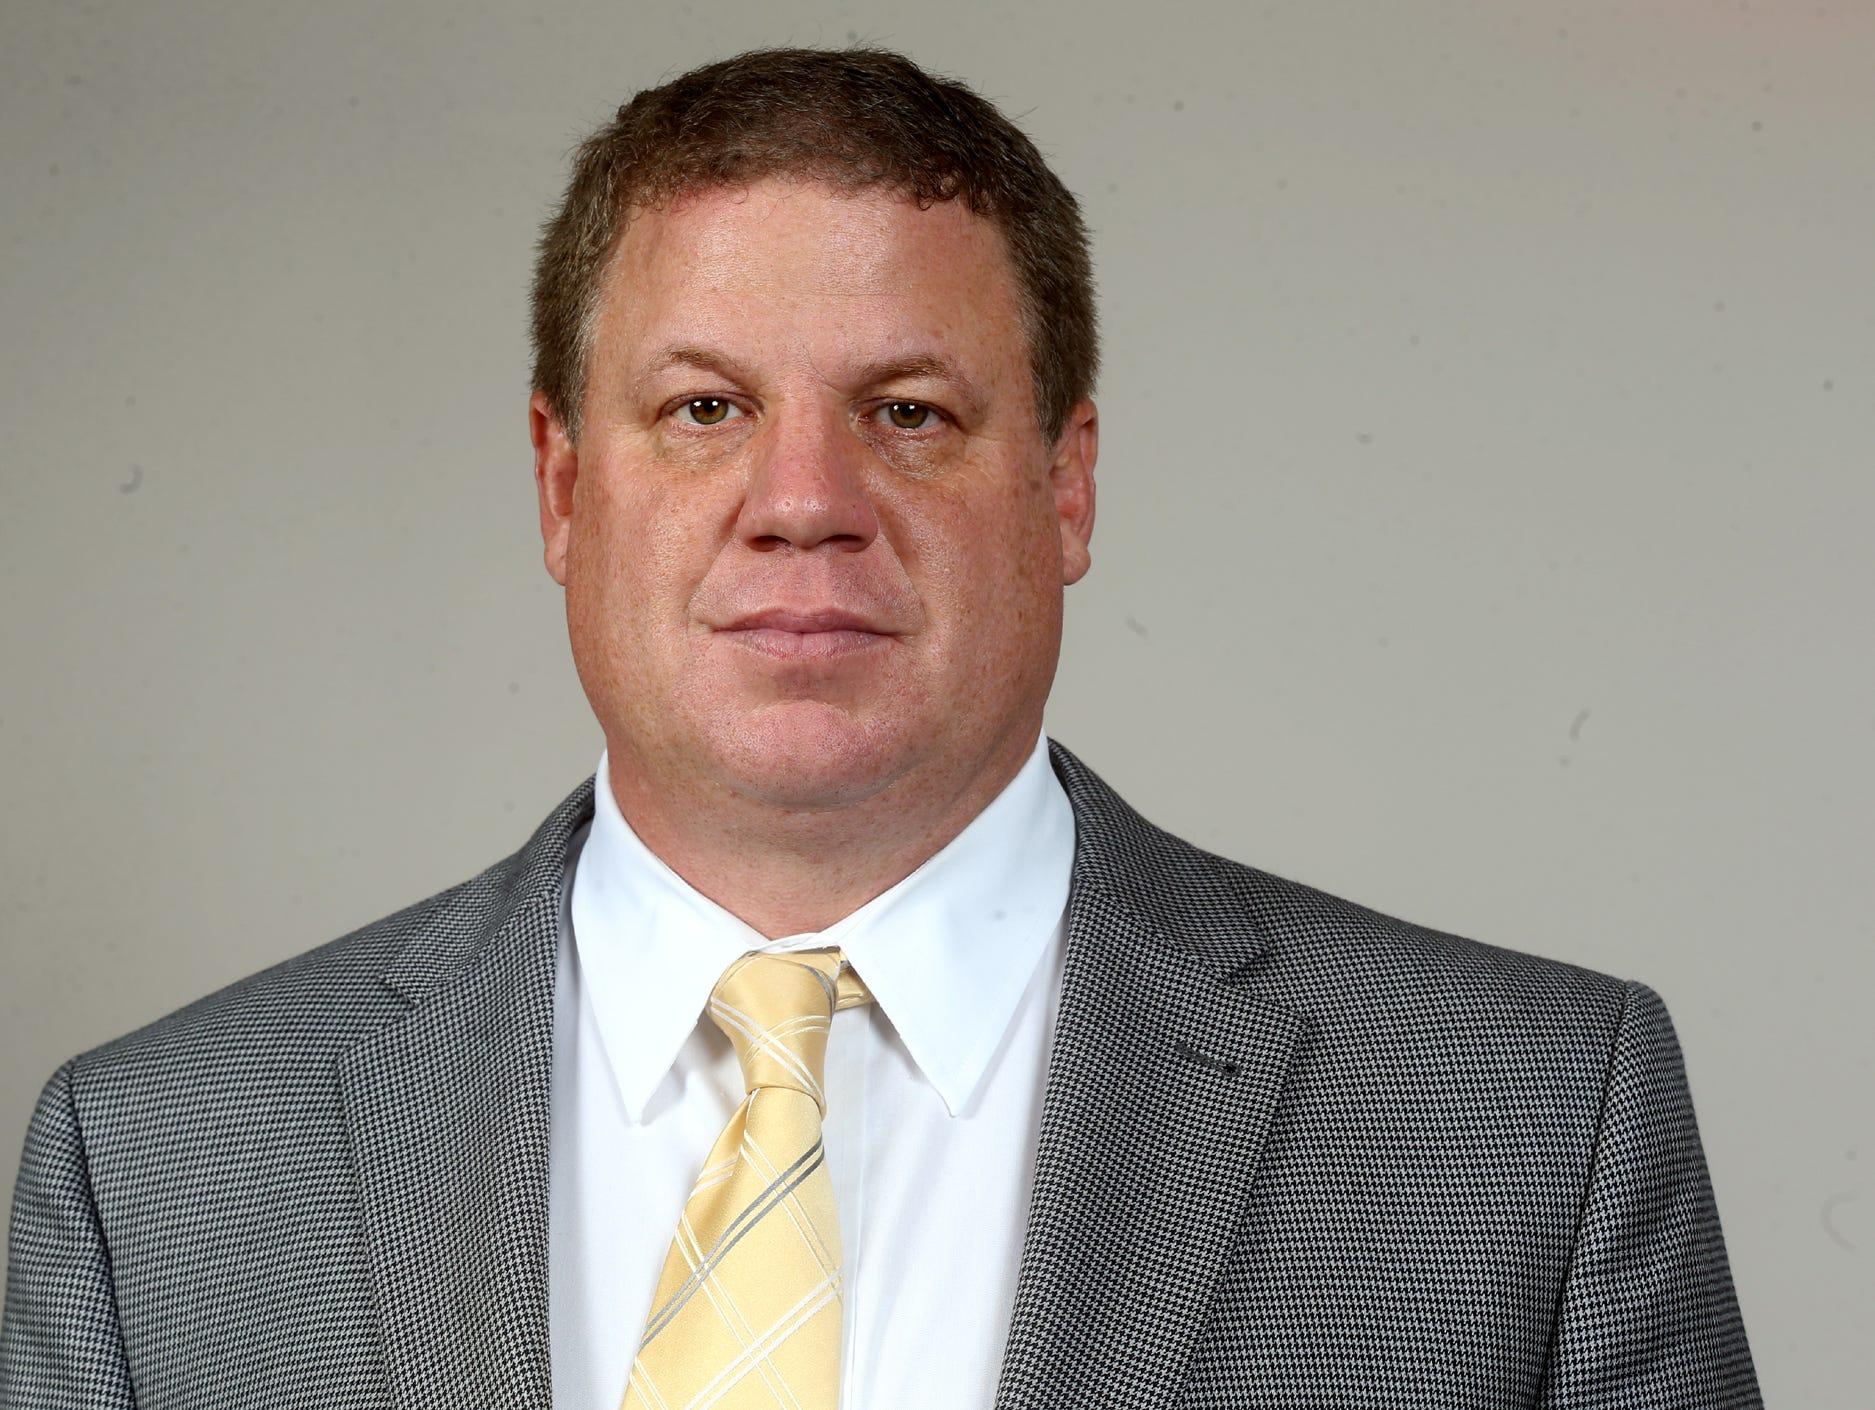 Coach Steve Matthews, head football coach for Knoxville Catholic, on Monday, Nov. 30, 2015, at the 2015 Mr. Football awards at Nissan Stadium.